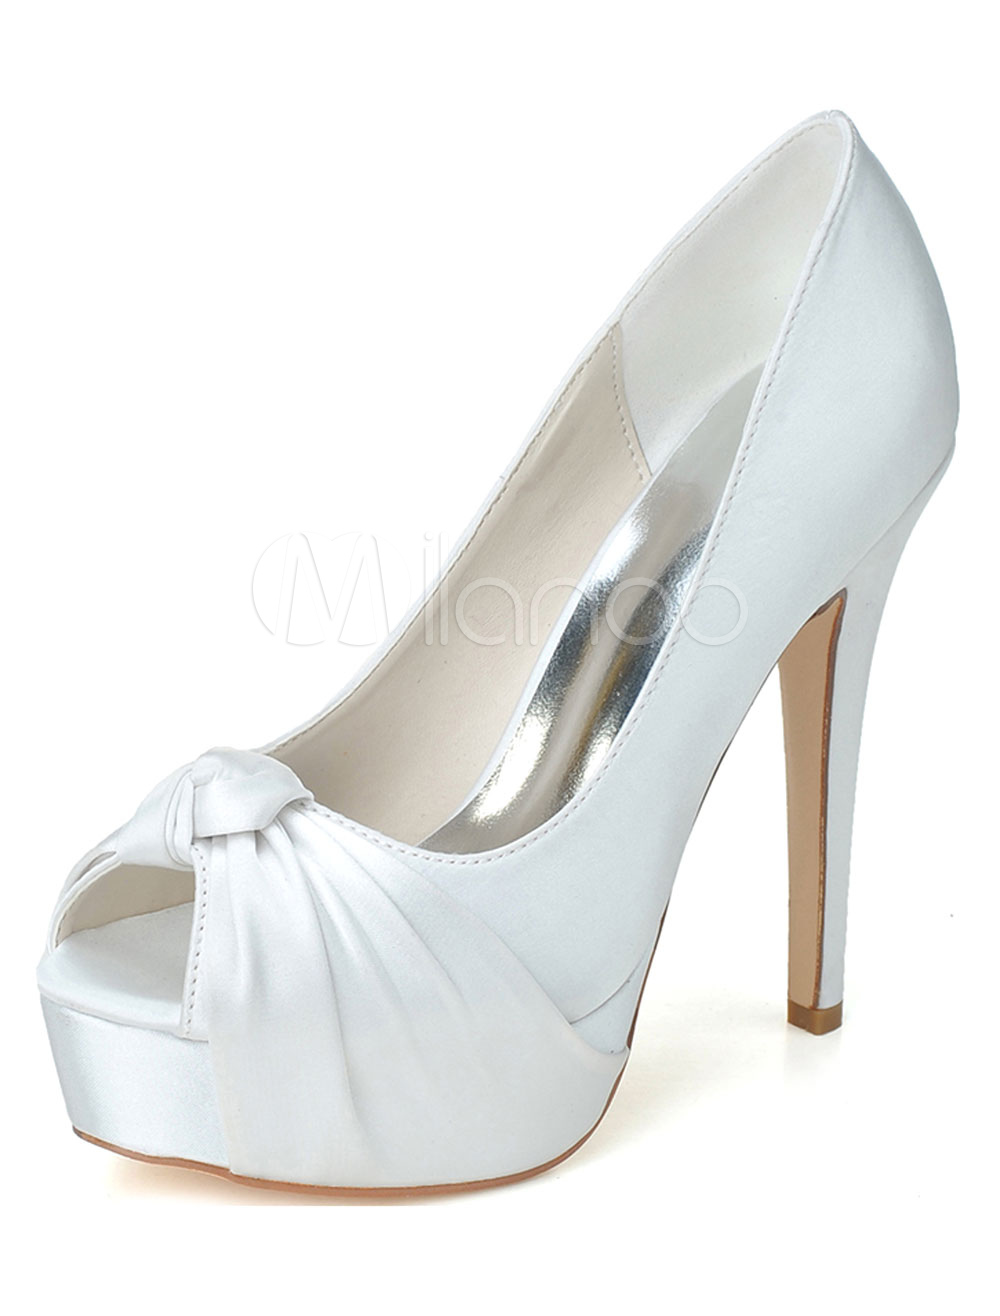 White Twisted Peep Toe Satin Evening & Bridal Sandals